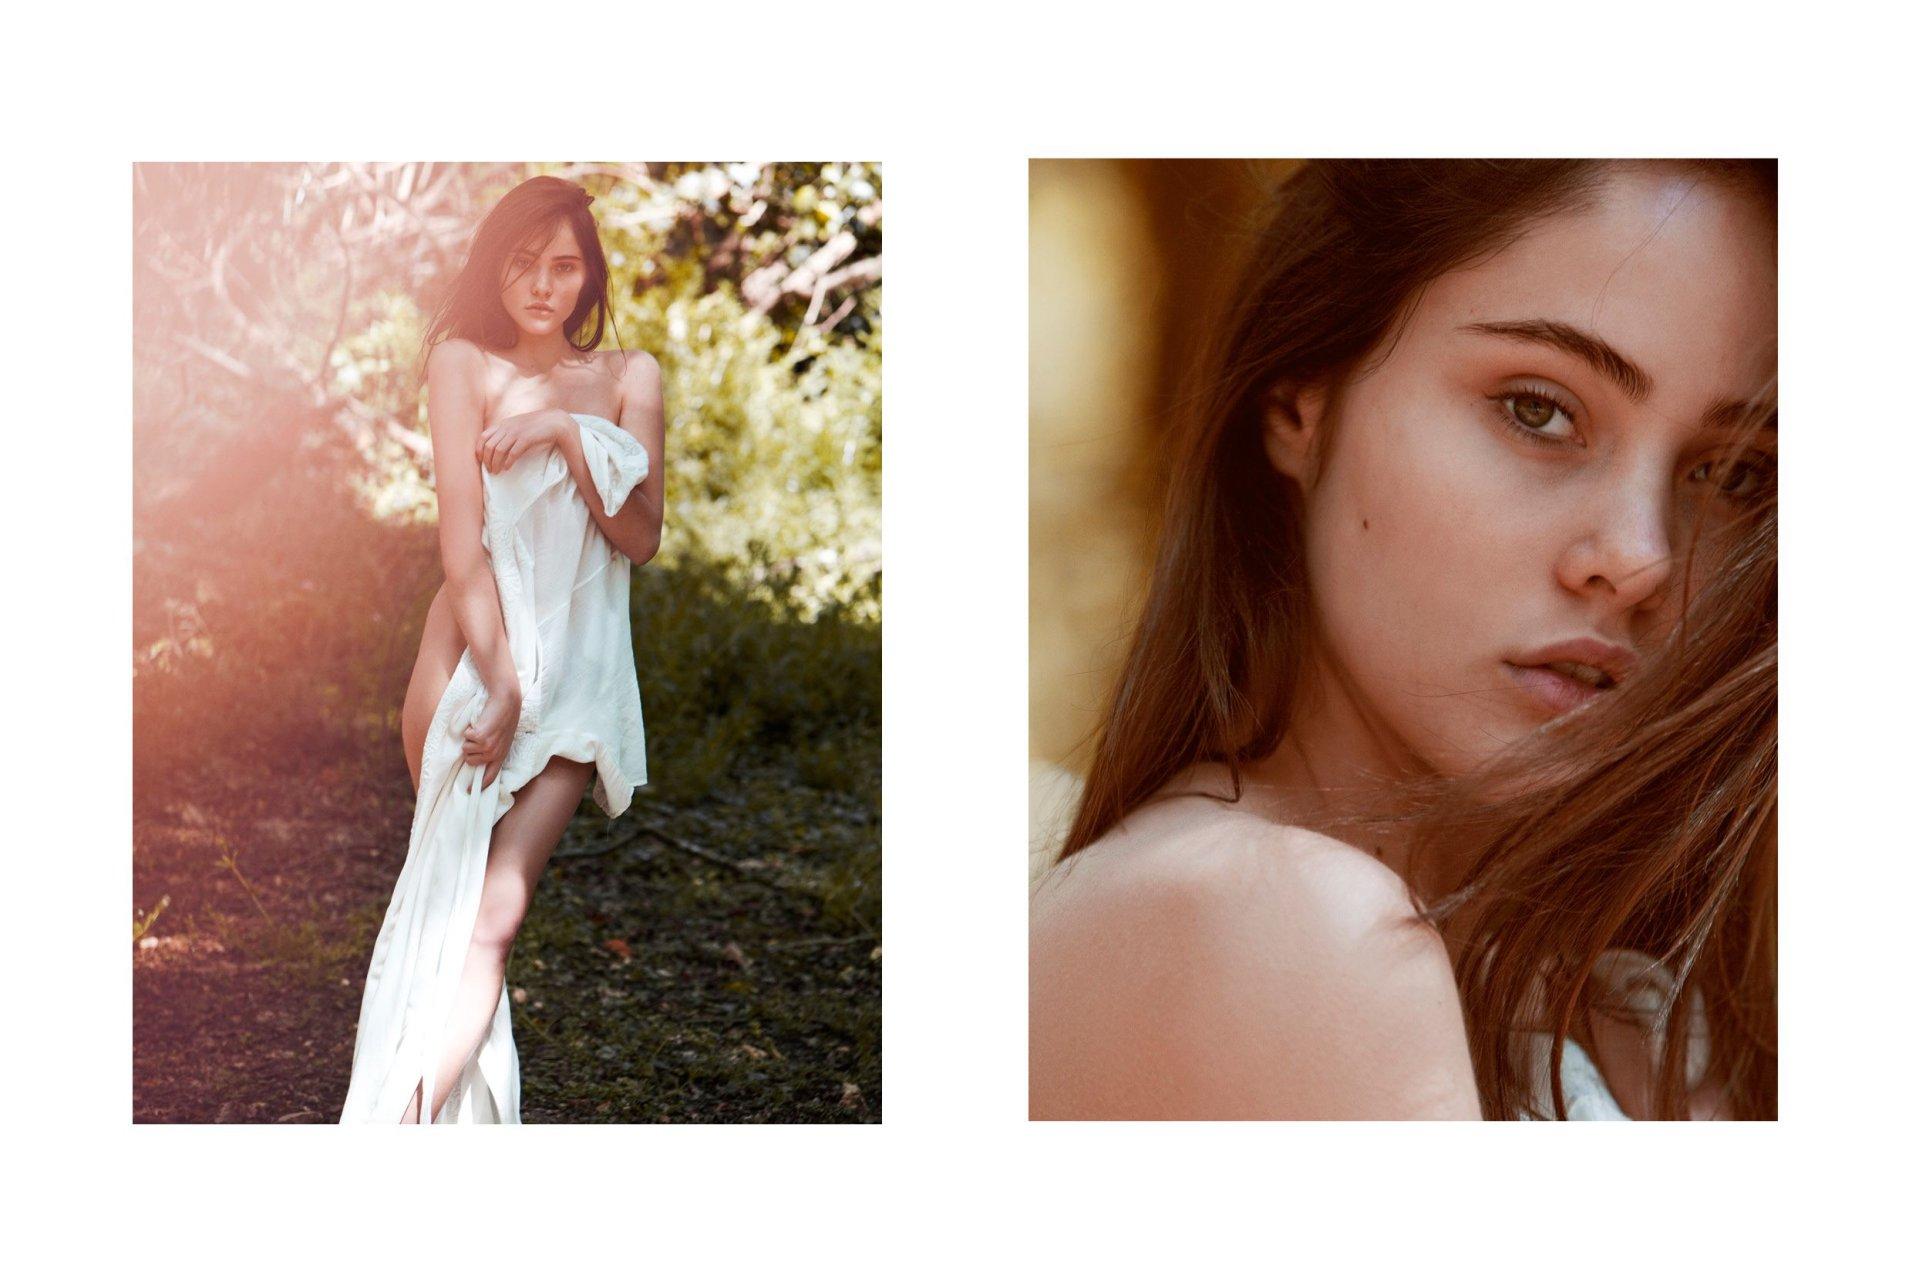 Ines garcia nude - 2019 year